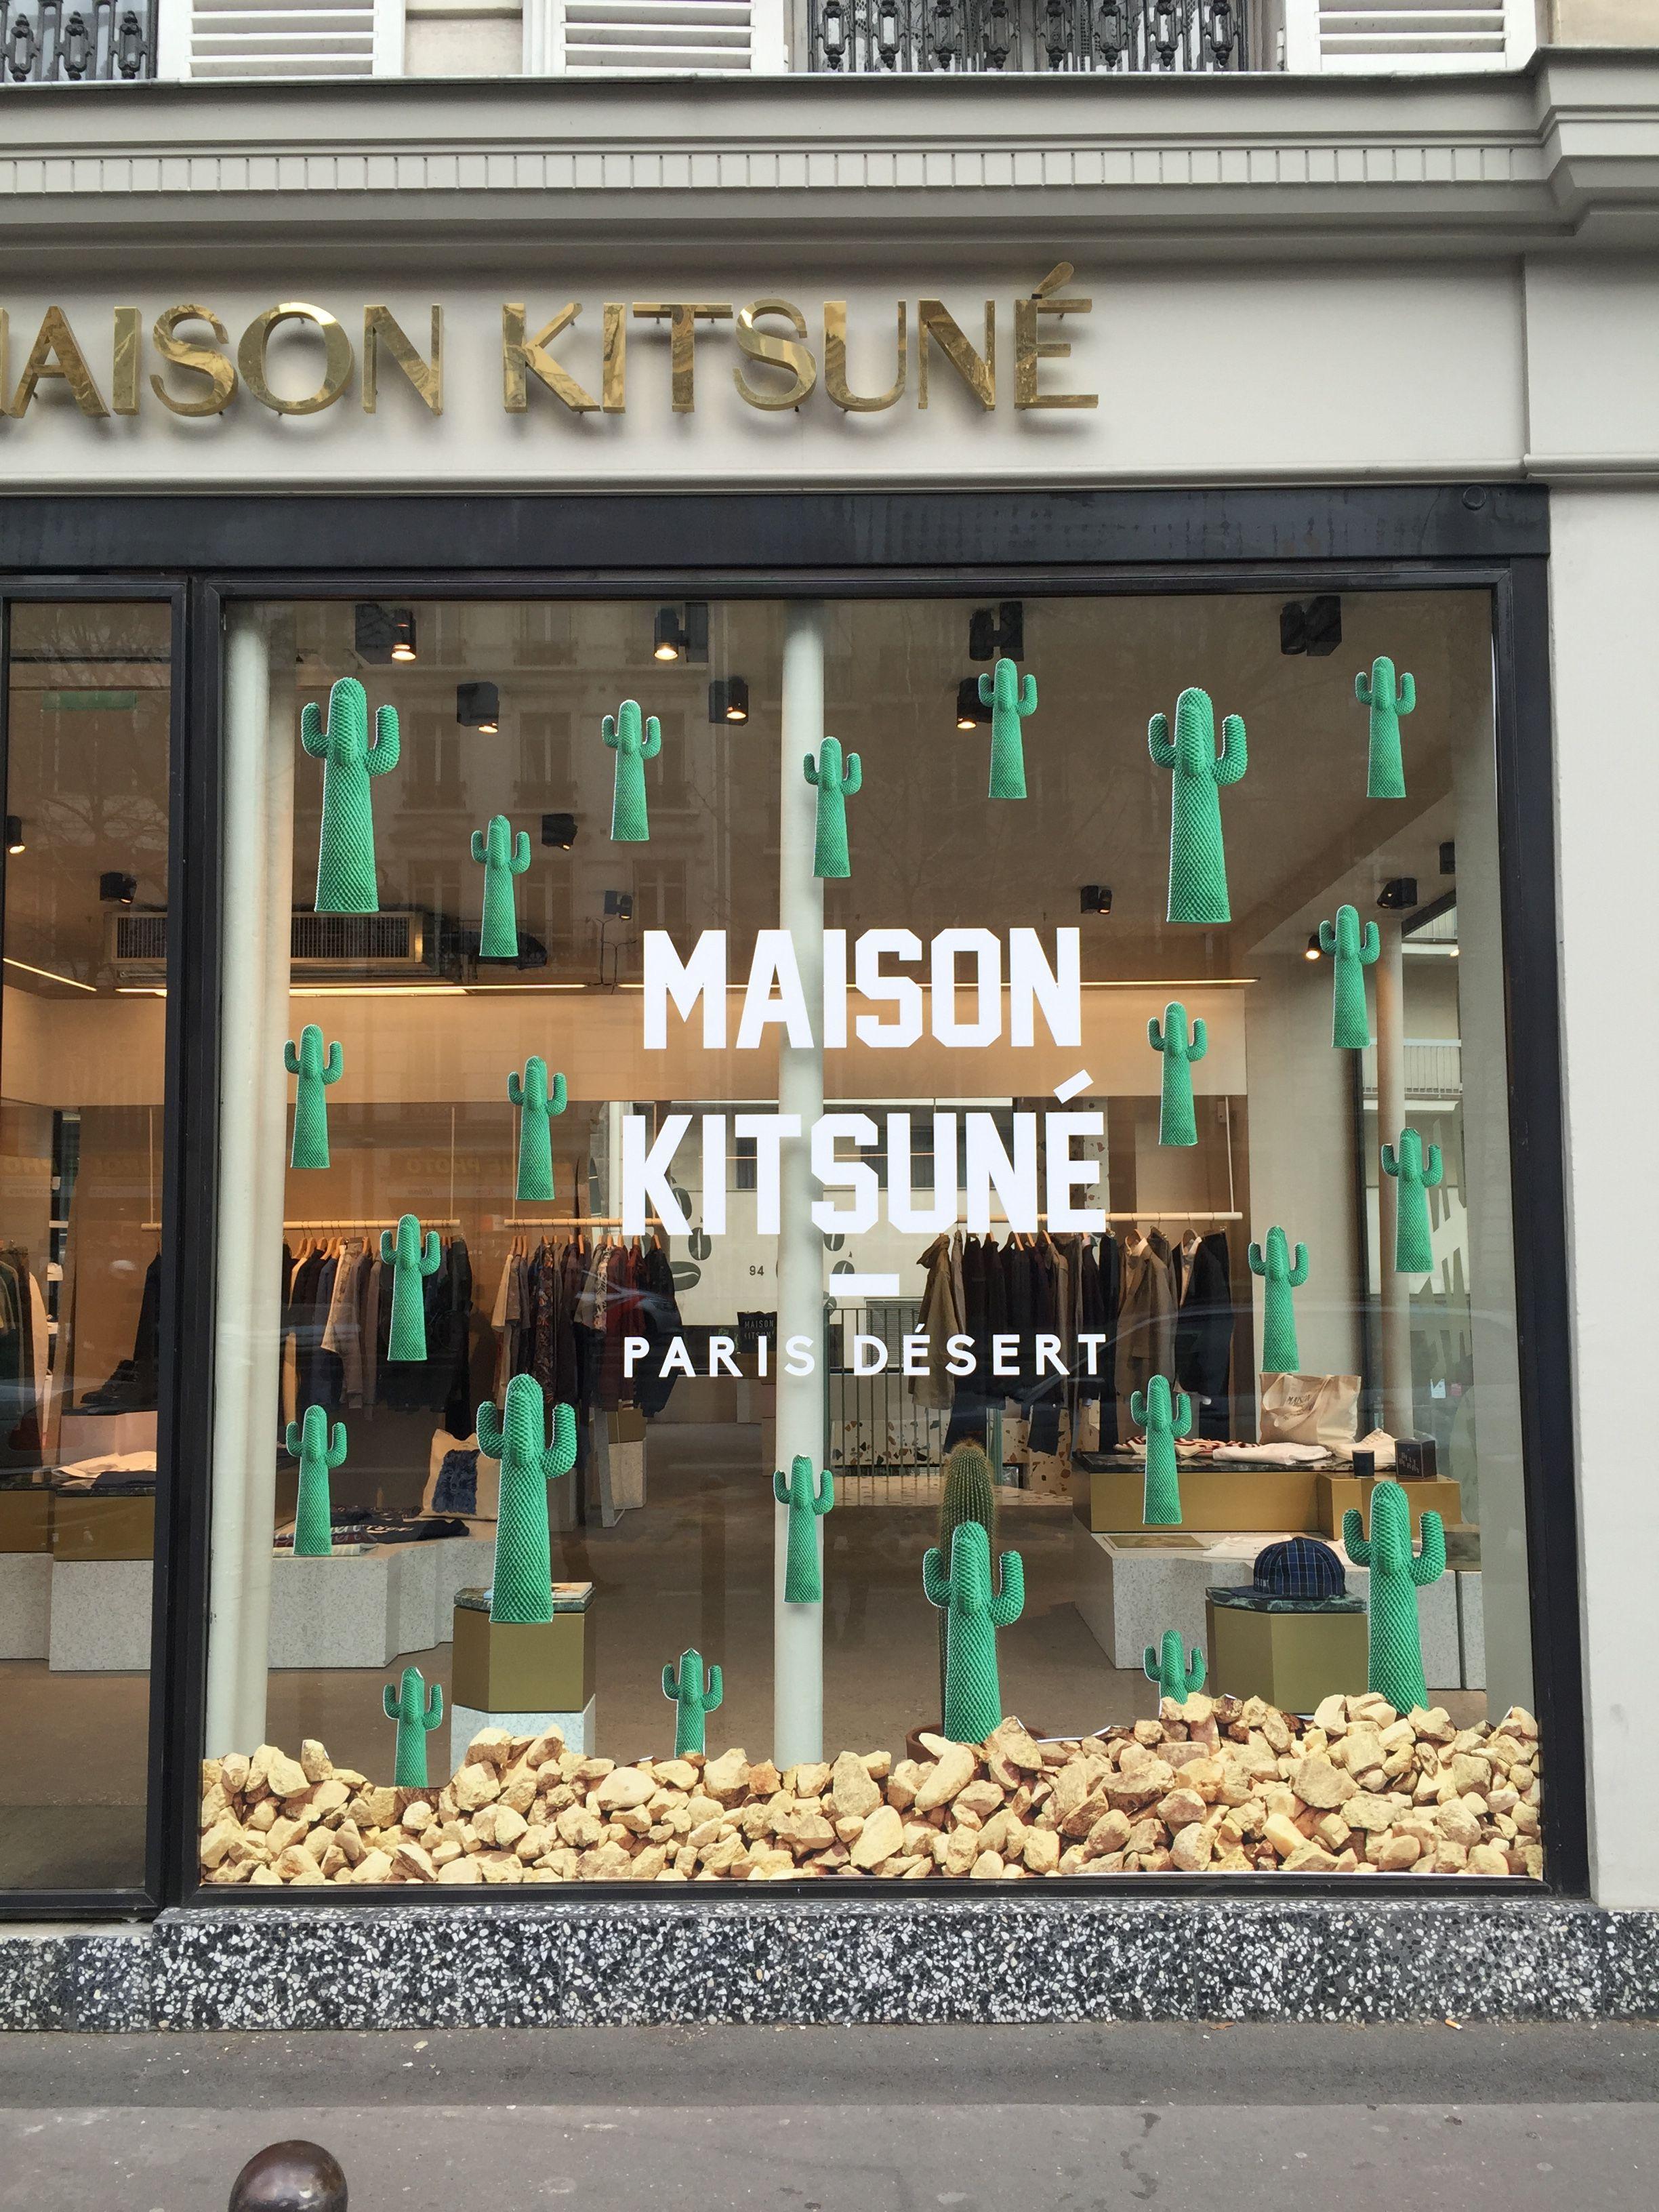 Maison Kitsun Paris Desert Window Display #Paris #Desert #Cactus #Cacti